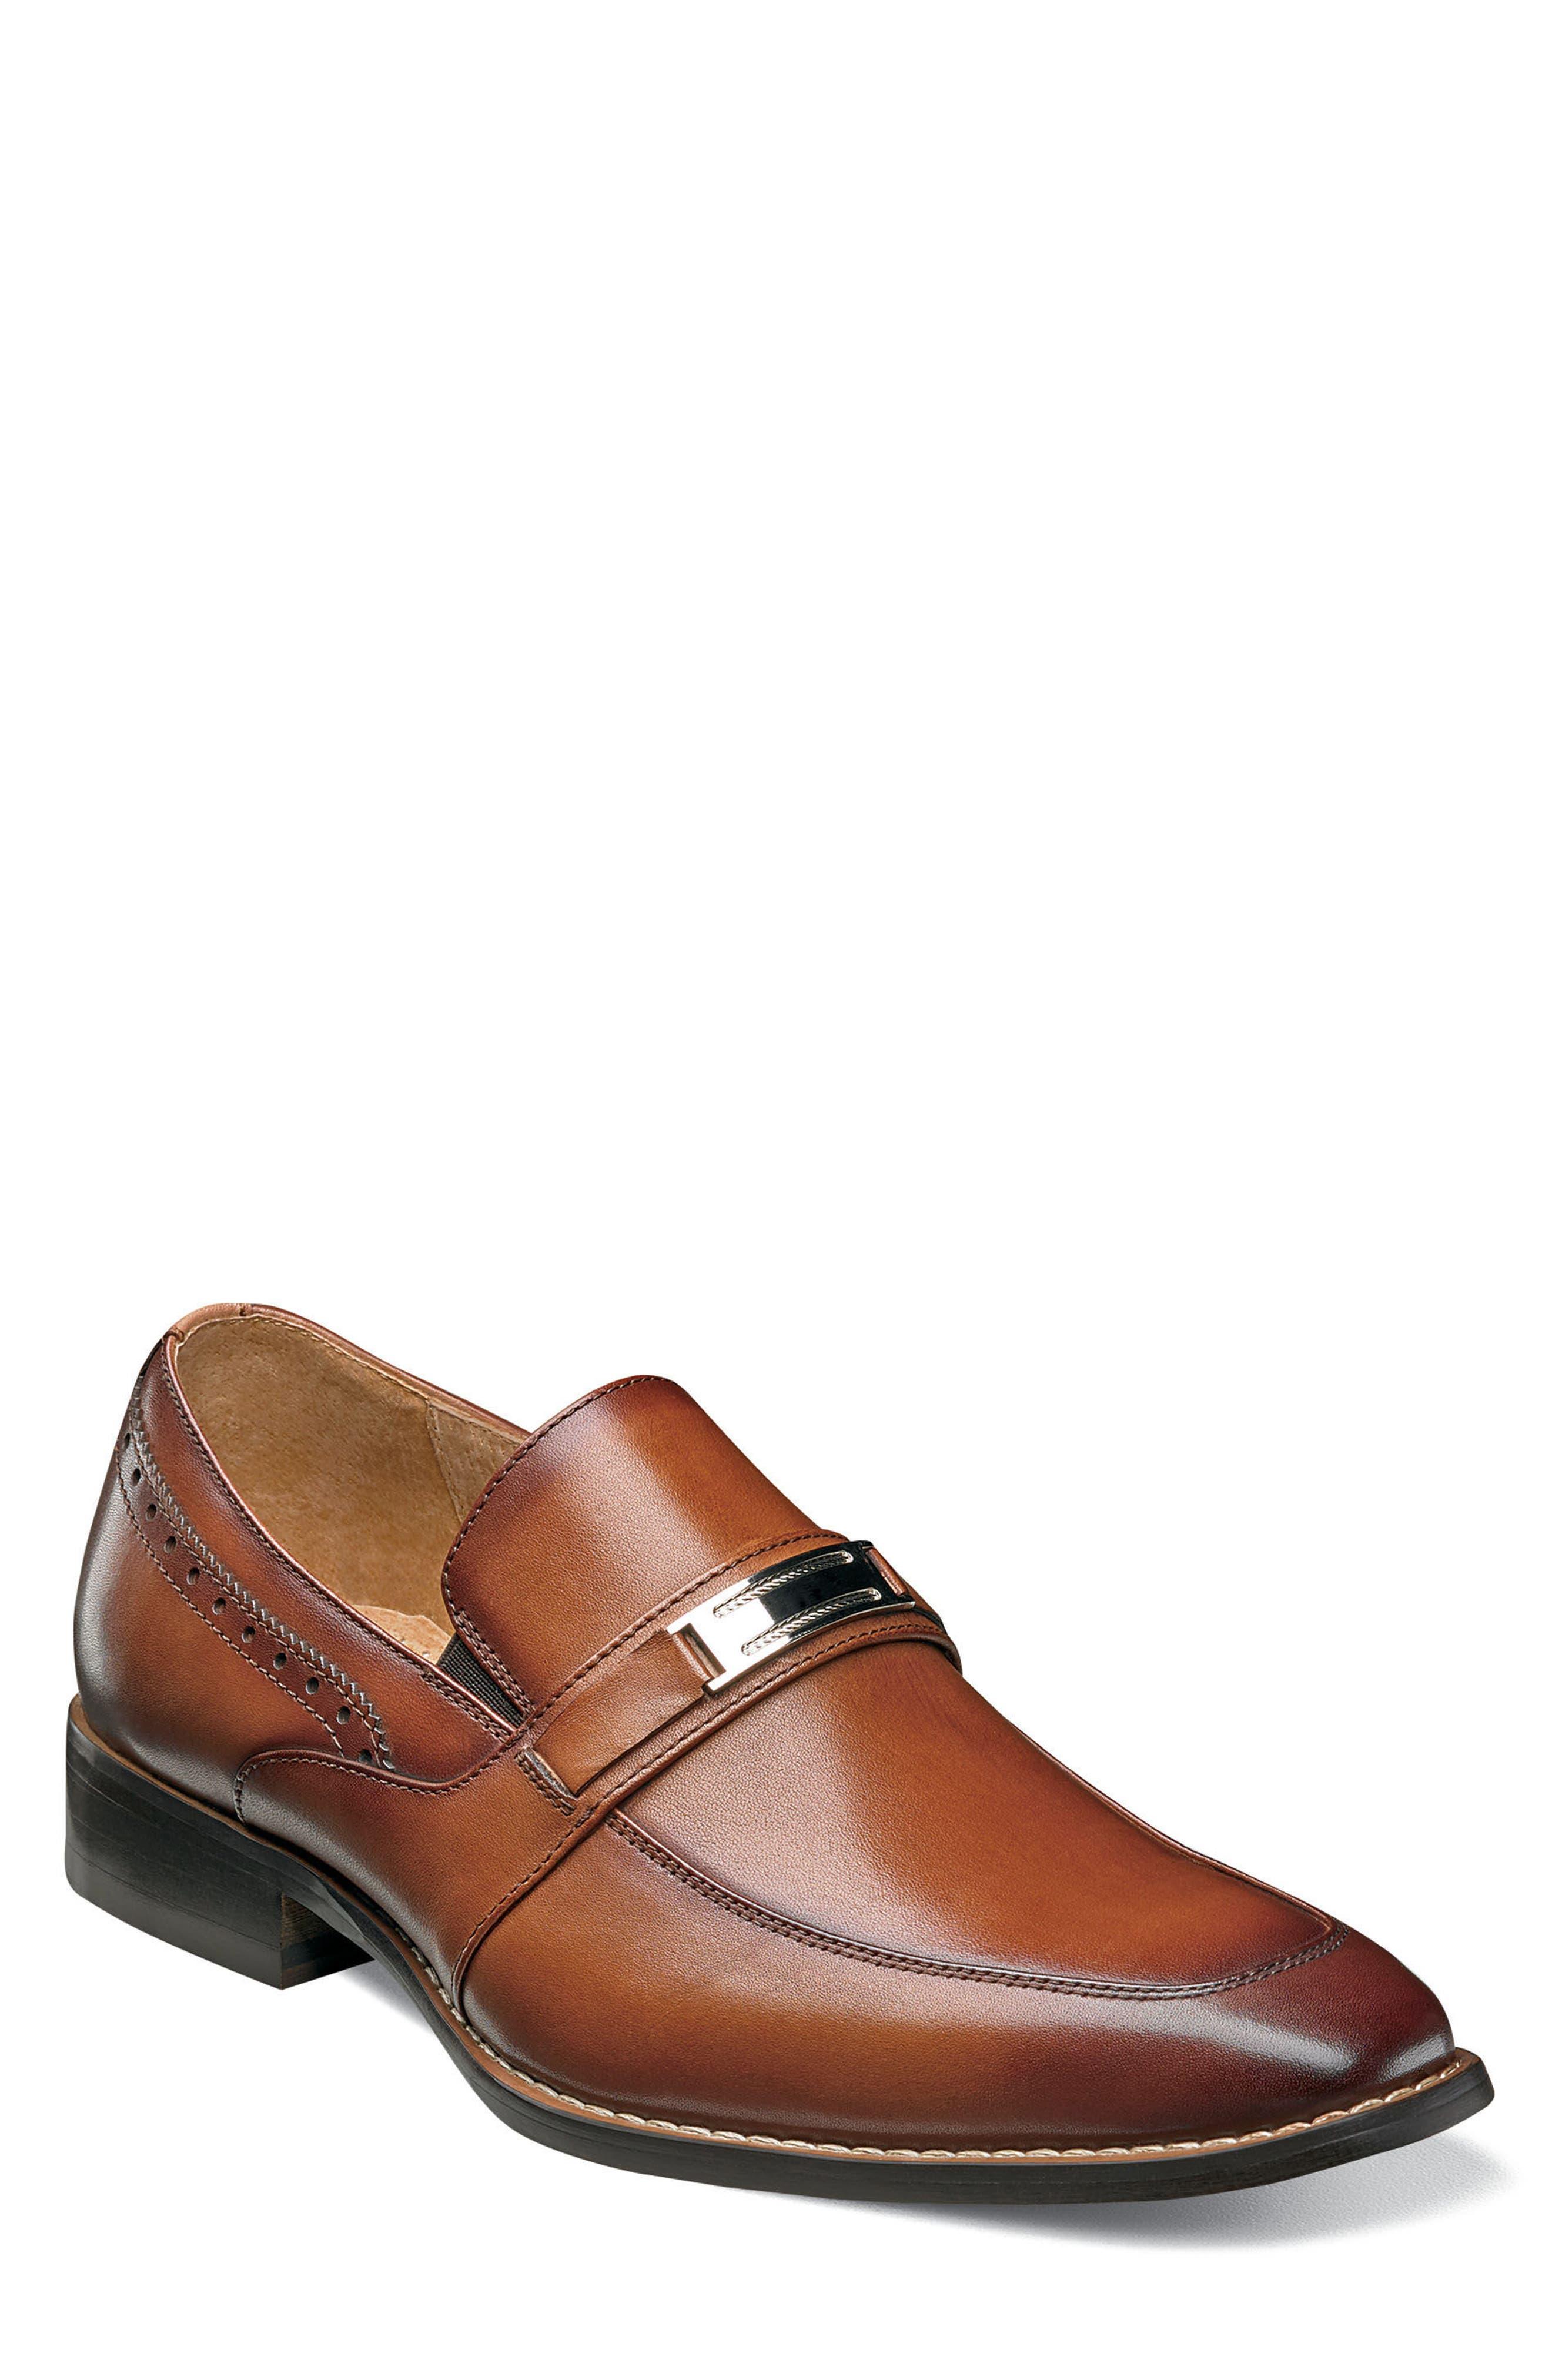 Shaw Bit Loafer,                             Main thumbnail 1, color,                             Cognac Leather